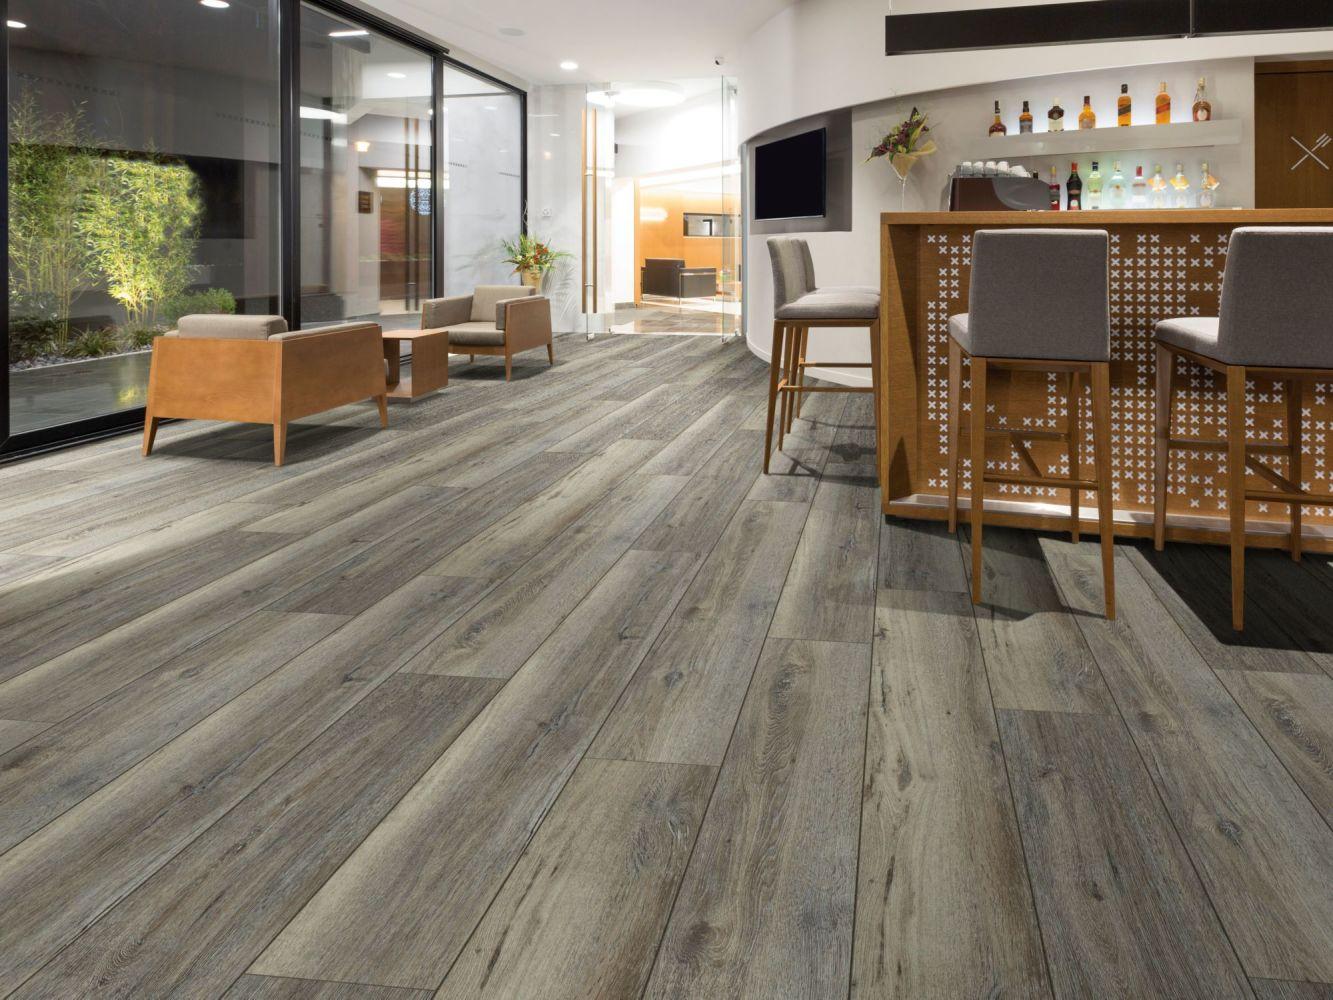 Shaw Floors Resilient Property Solutions White Oak 720c Plus Silver Oak 05003_516RG